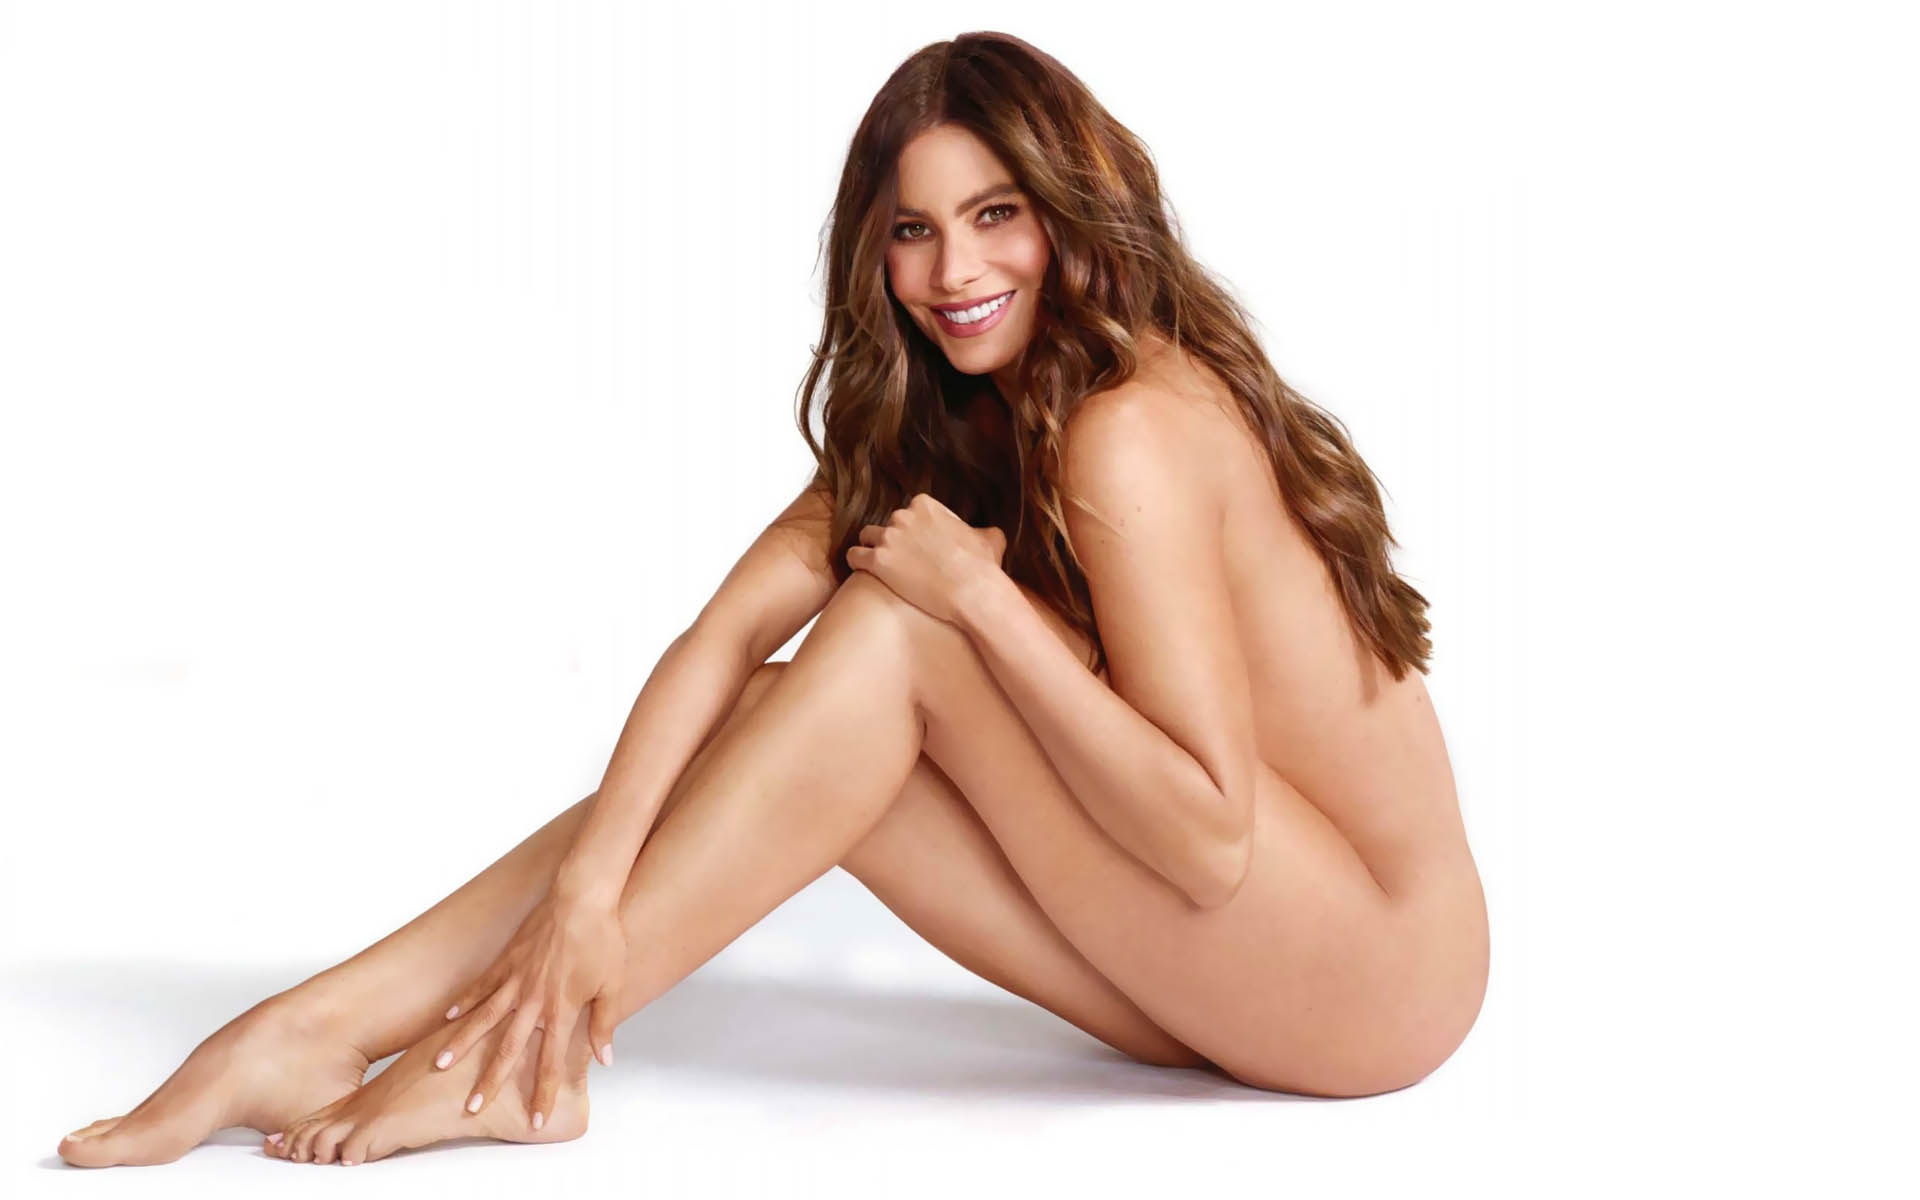 Sofia vergara nude, topless pictures, playboy photos, sex scene uncensored